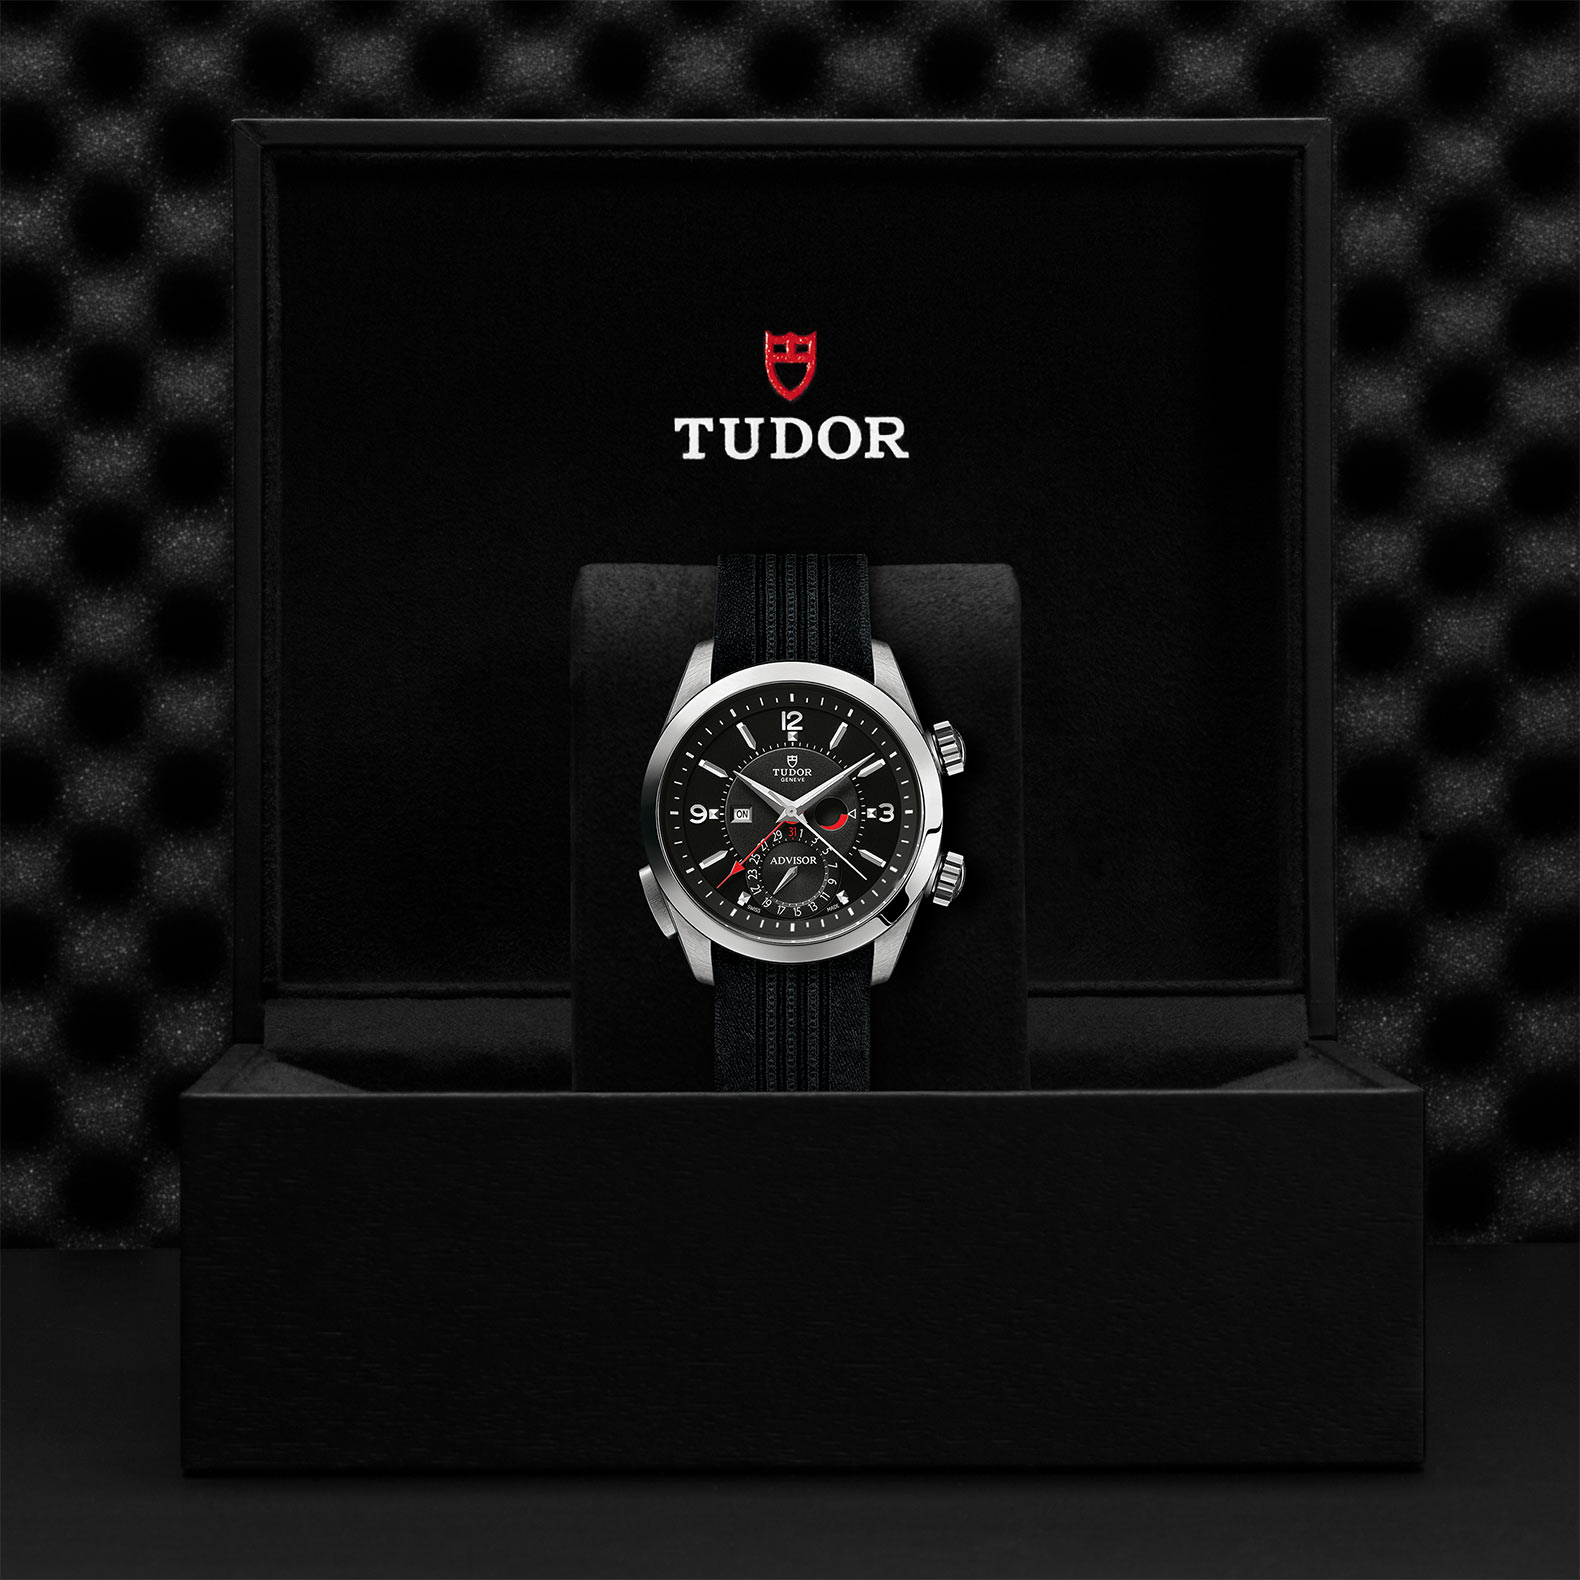 TUDOR Heritage Advisor - M79620TN-0004